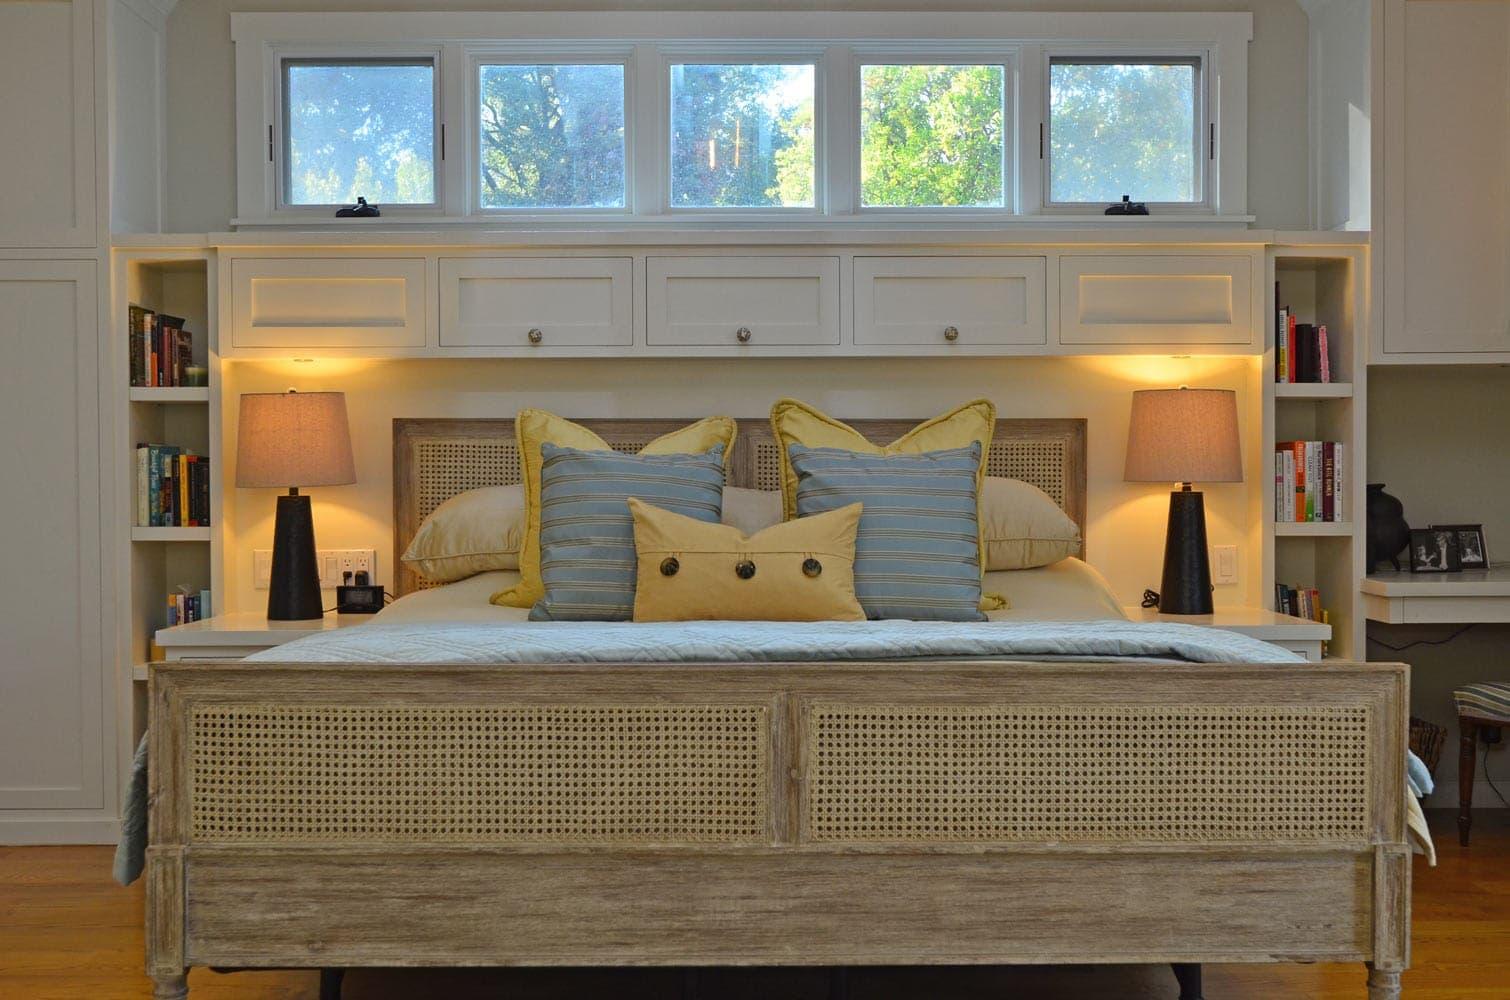 Master bedroom interior design of a house in Verdugo Woodlands, CA